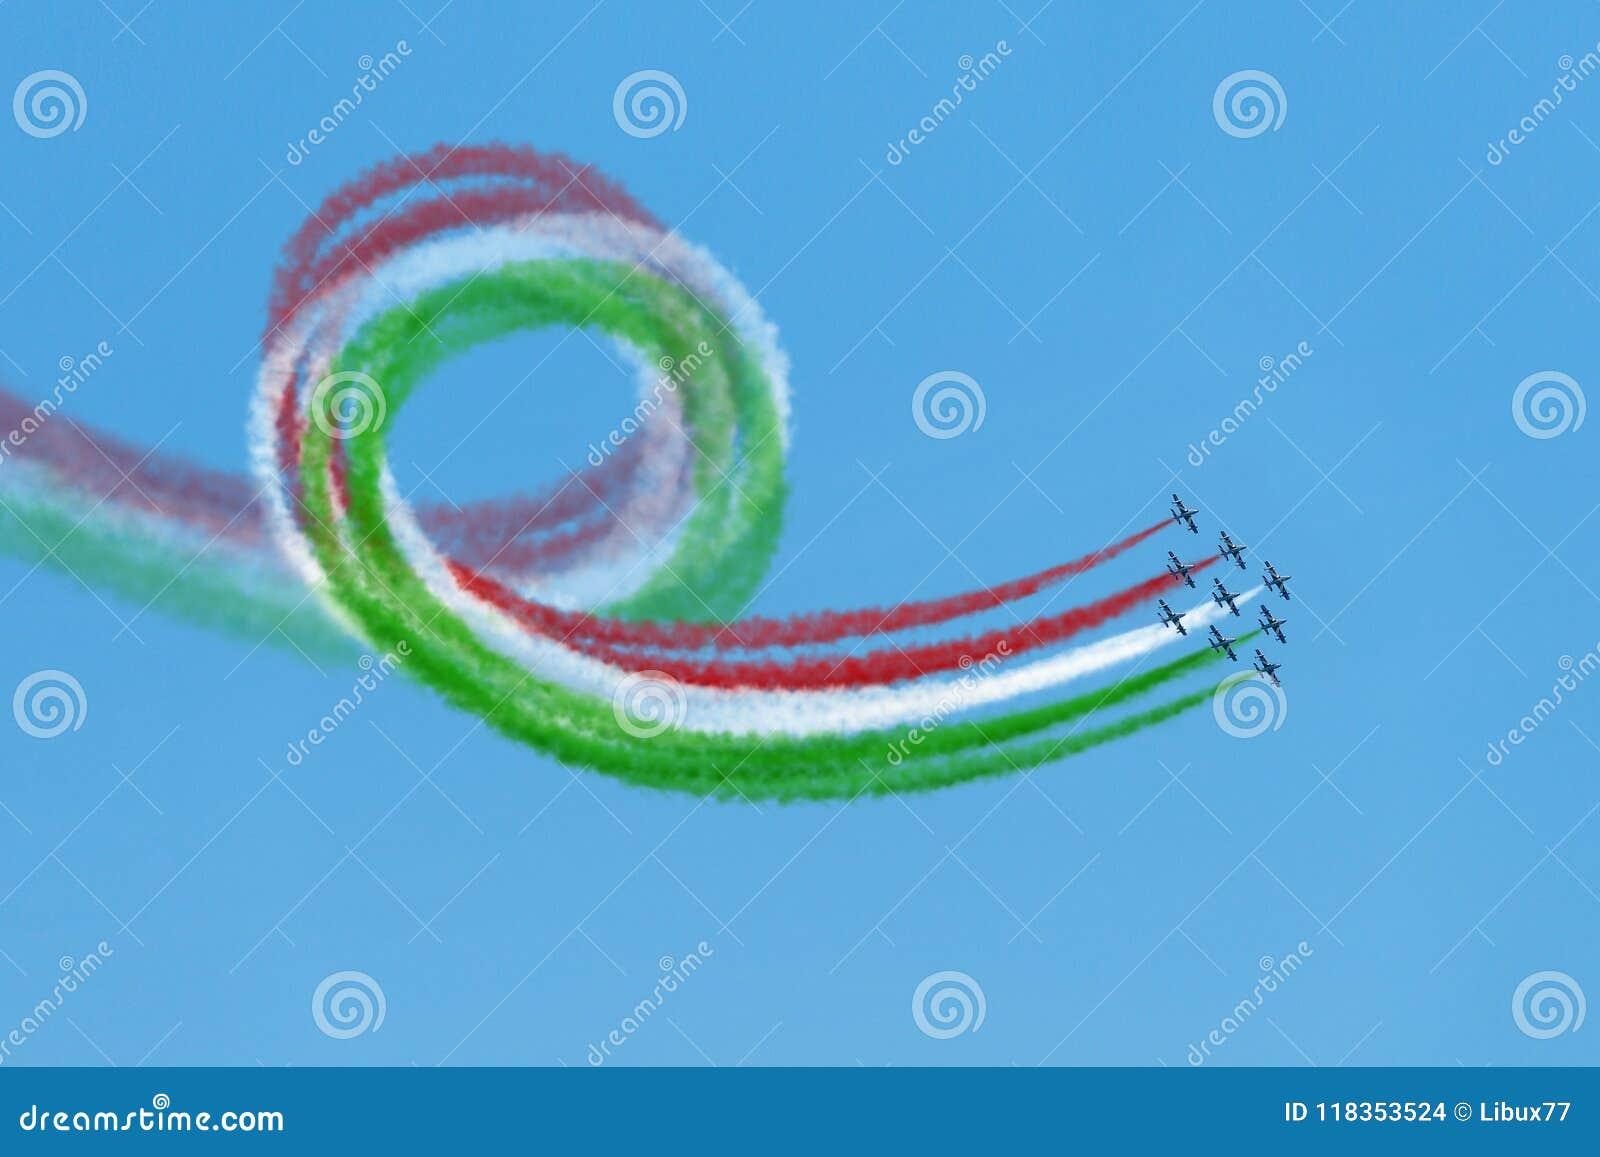 Air show aerobatic italian team frecce tricolore flying loop